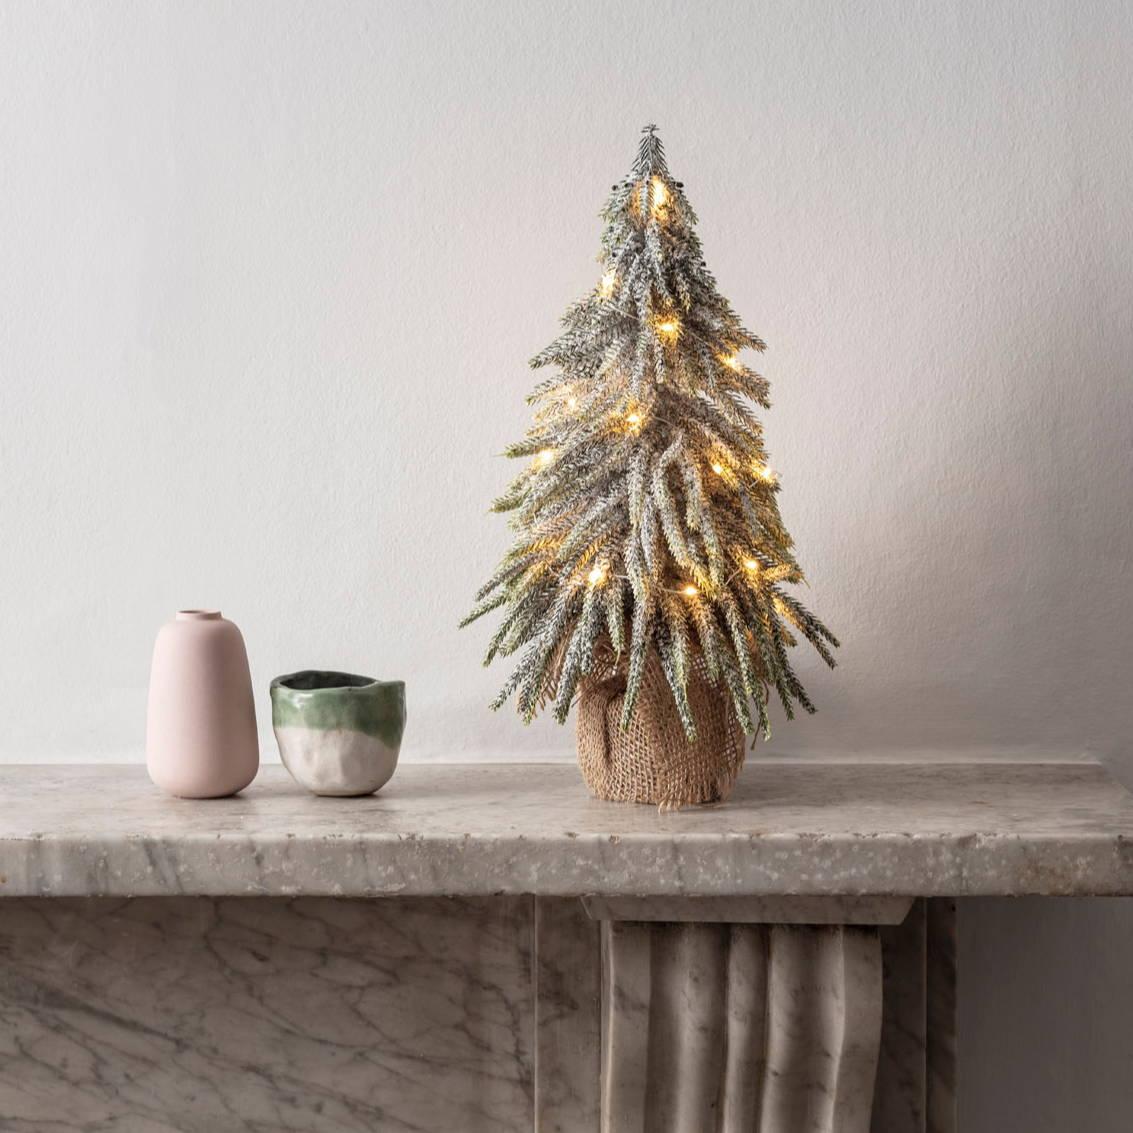 LED Mini Weihnachtsbaum auf Kaminsims